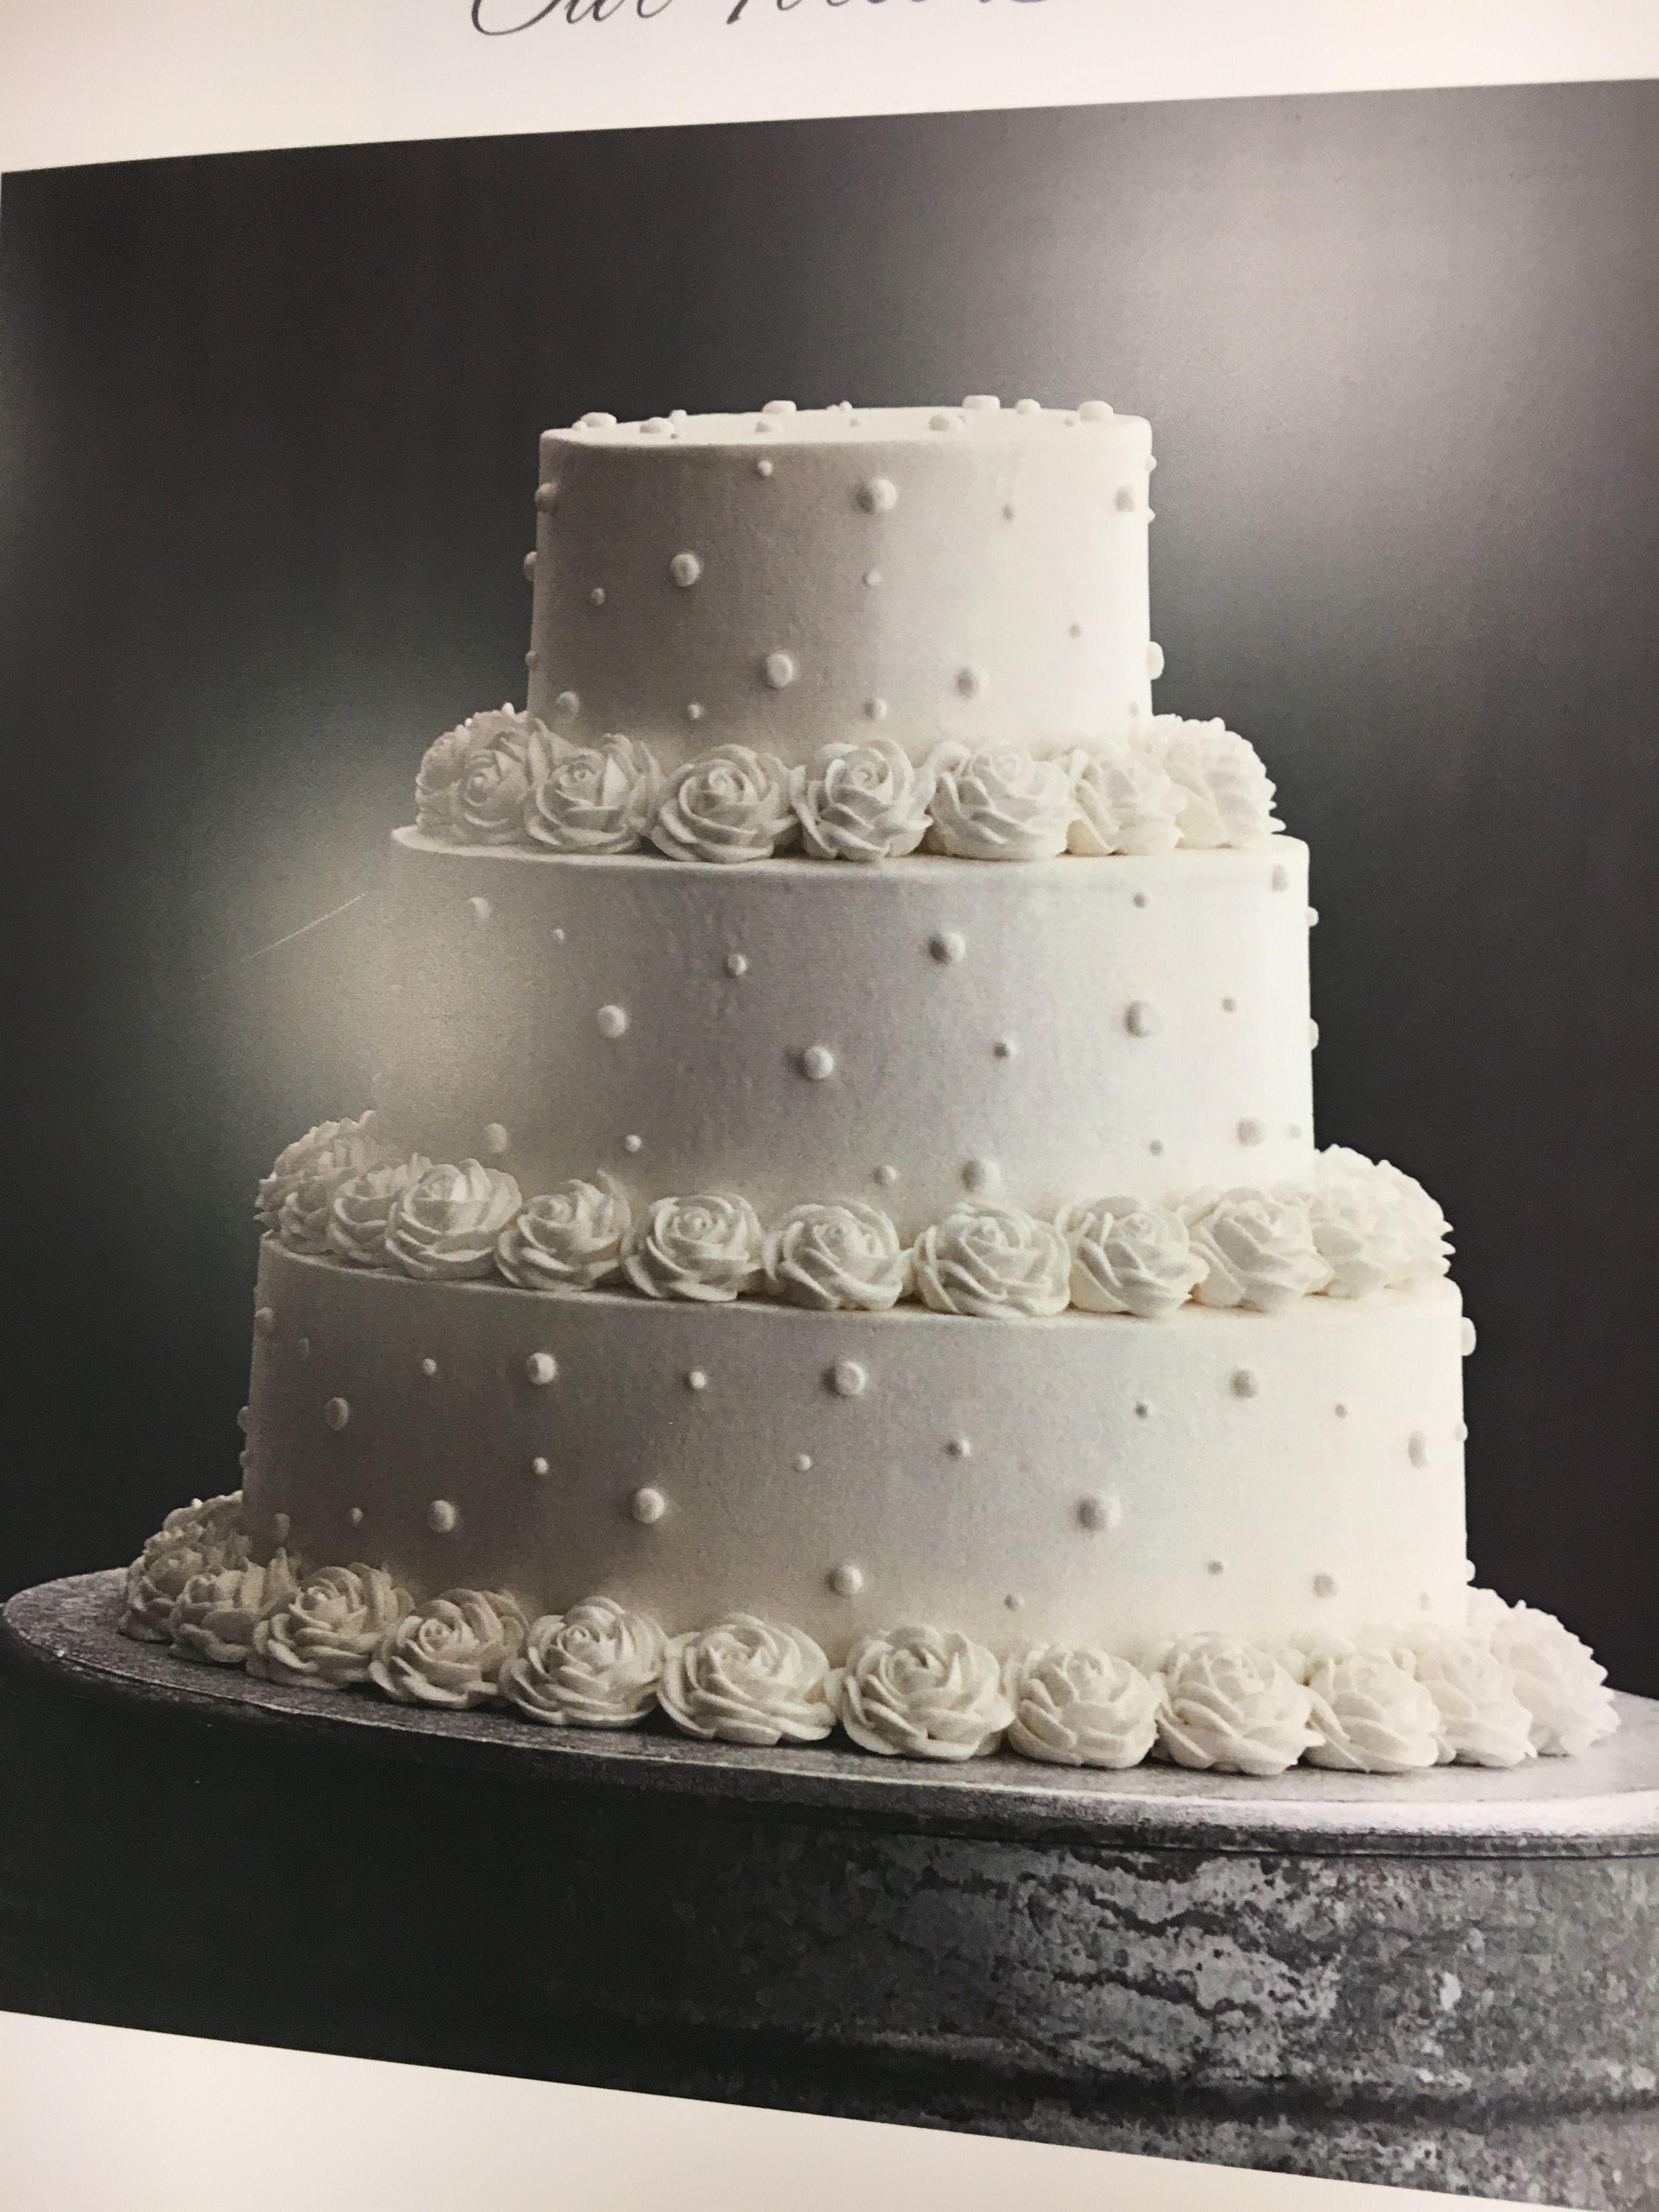 Publix Publix wedding cake, Fall wedding cakes, Publix cakes